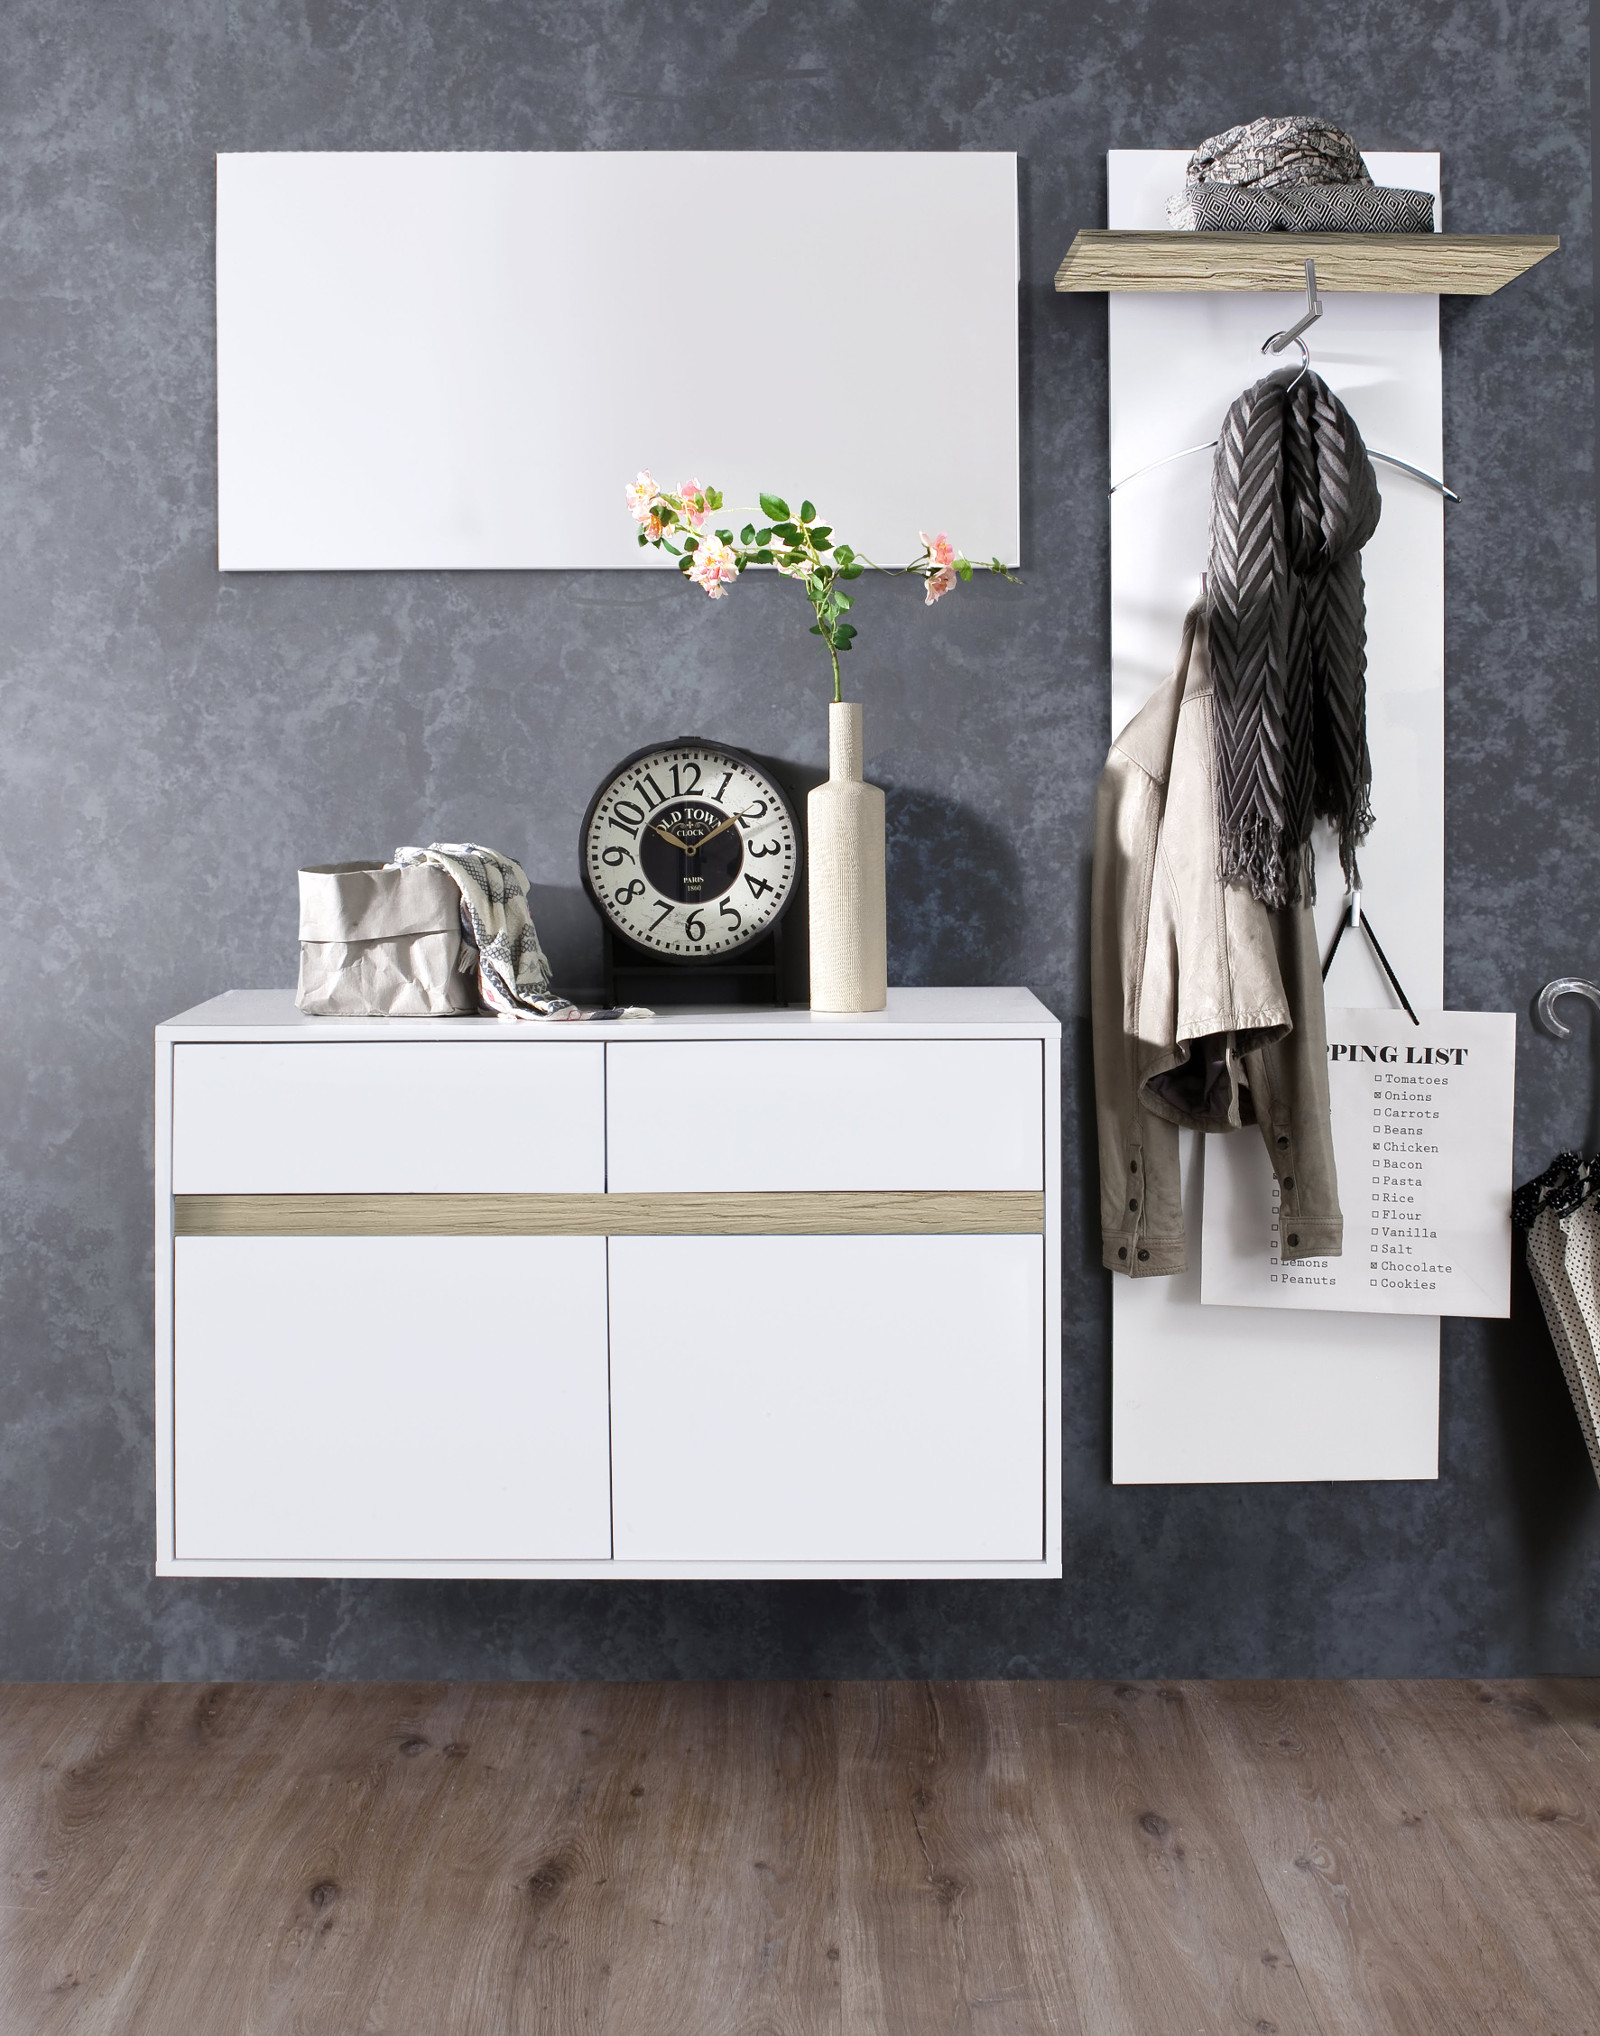 Wandspiegel Garderobenspiegel Sol Weiss 96x50 Cm